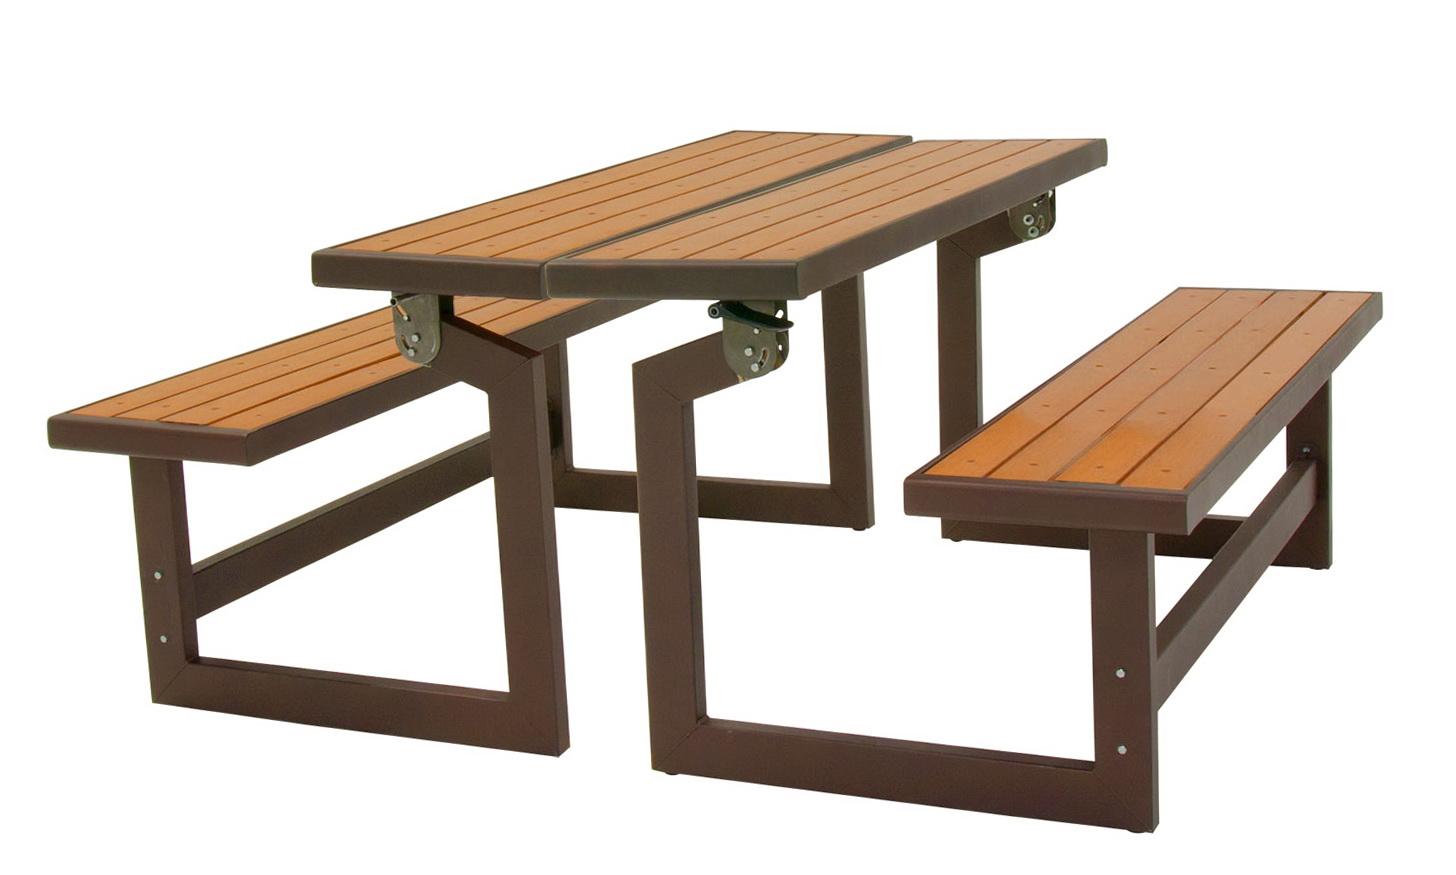 Convertible Bench Picnic Table Plans Home Design Ideas